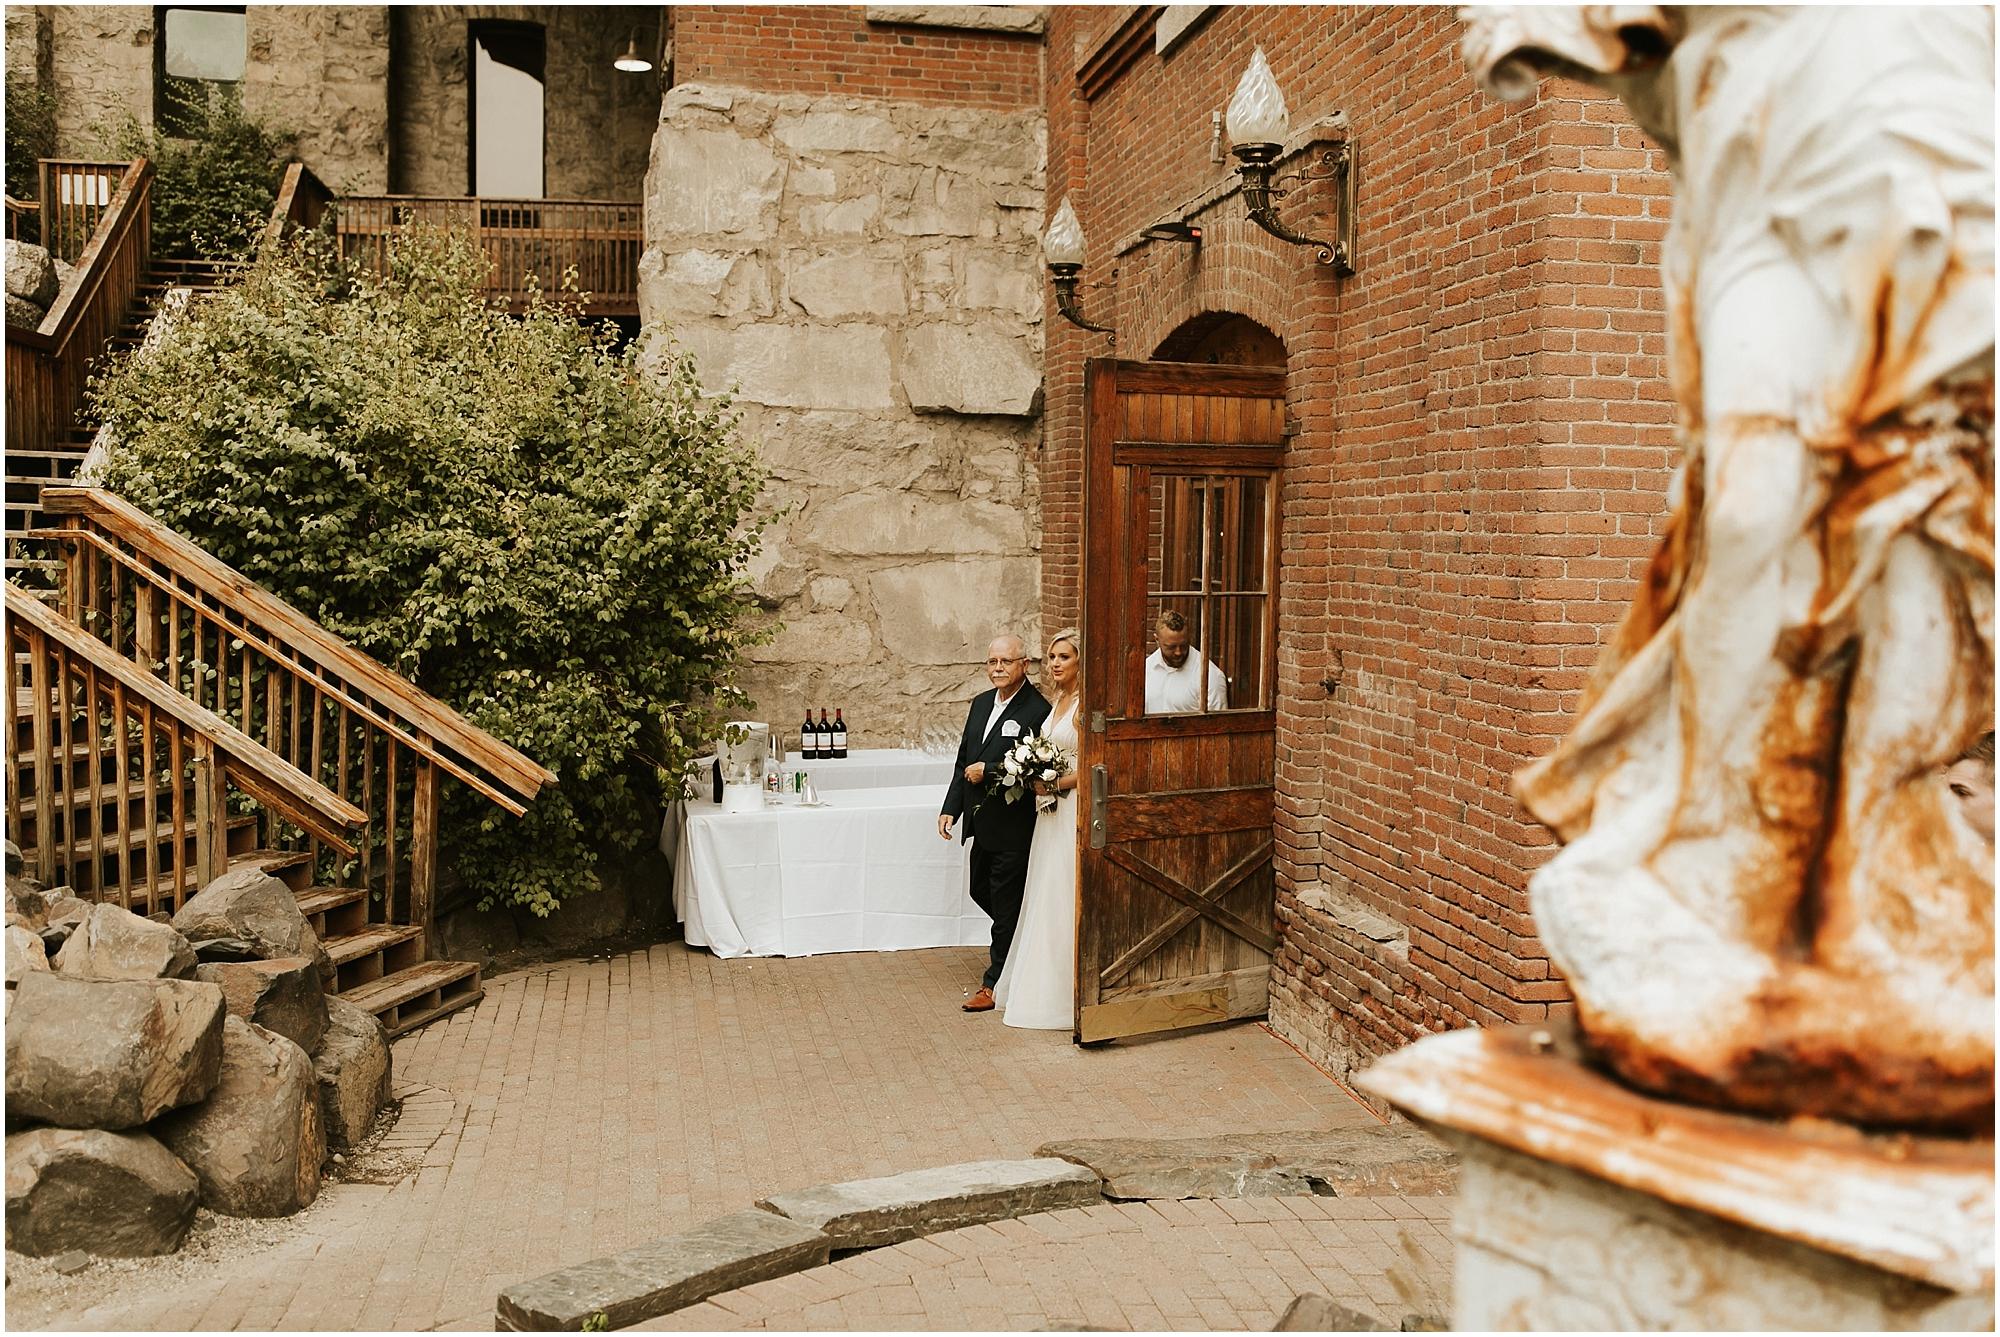 Chateau Rive Spokane Wedding Cassie Trottier Photography1064.jpg